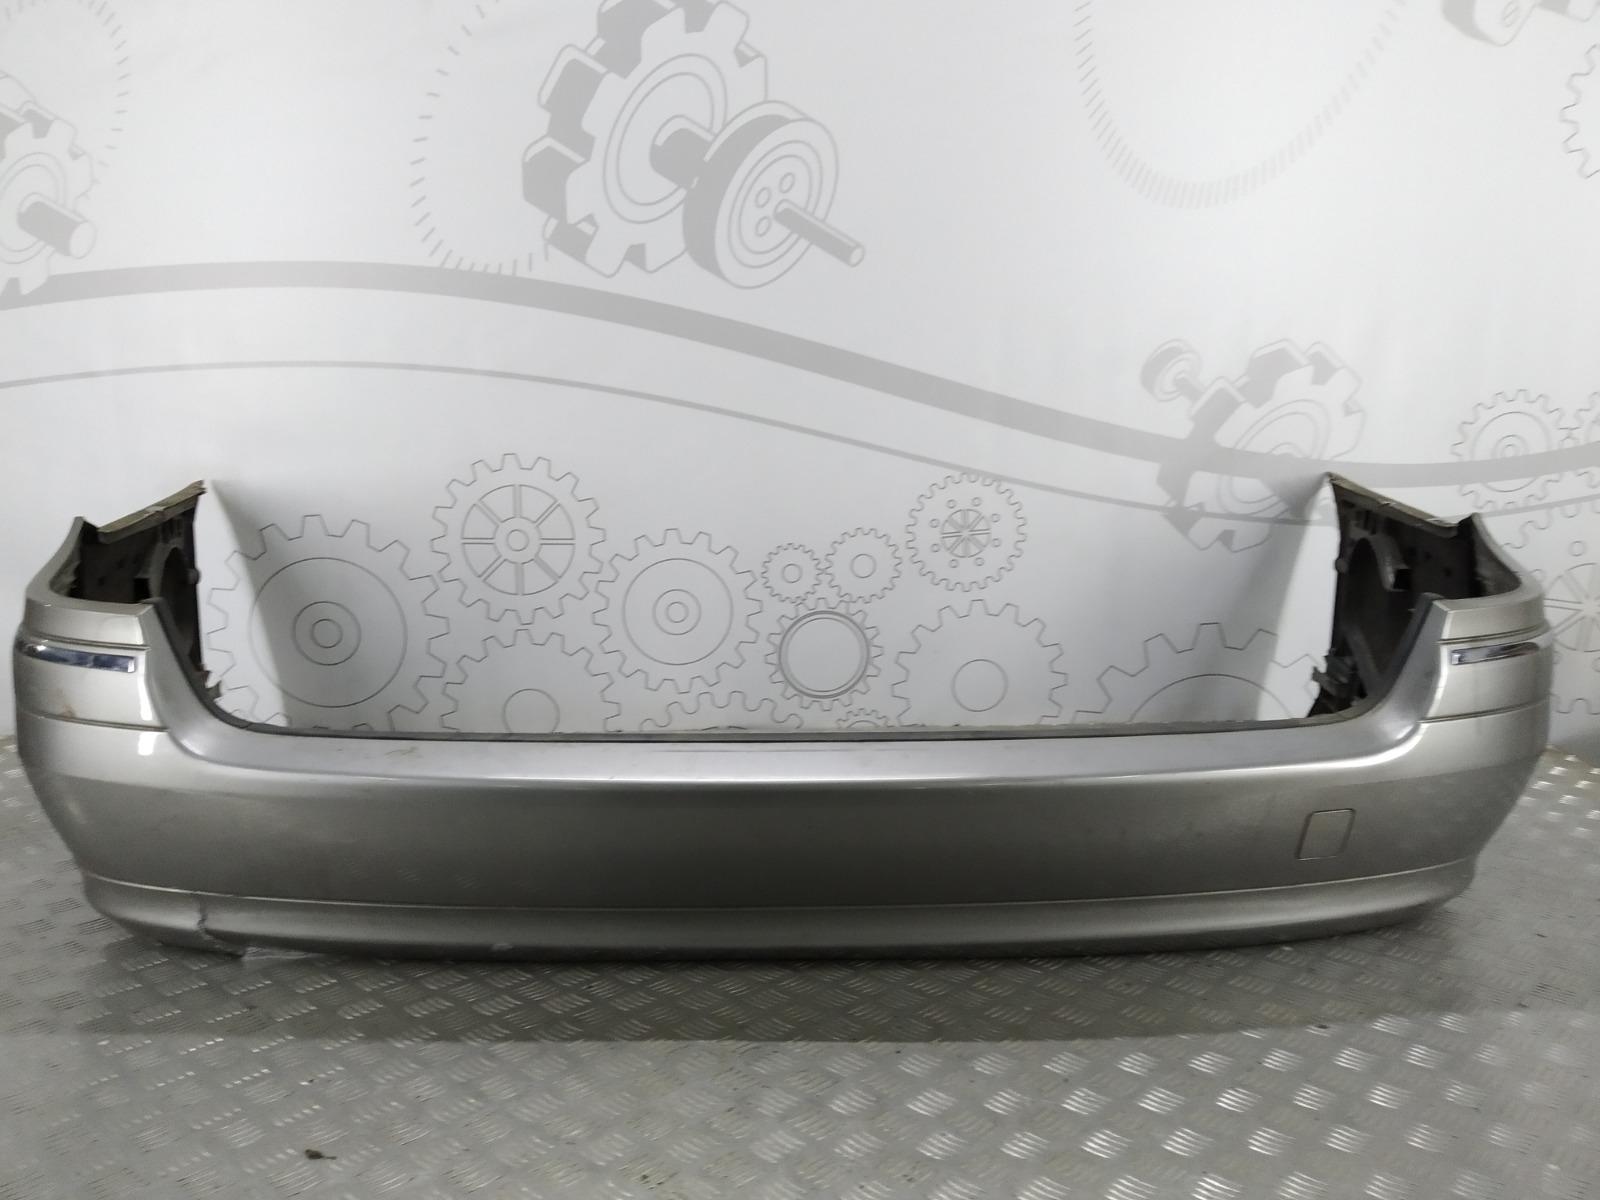 Бампер задний Mercedes E W211 1.8 I 2003 (б/у)